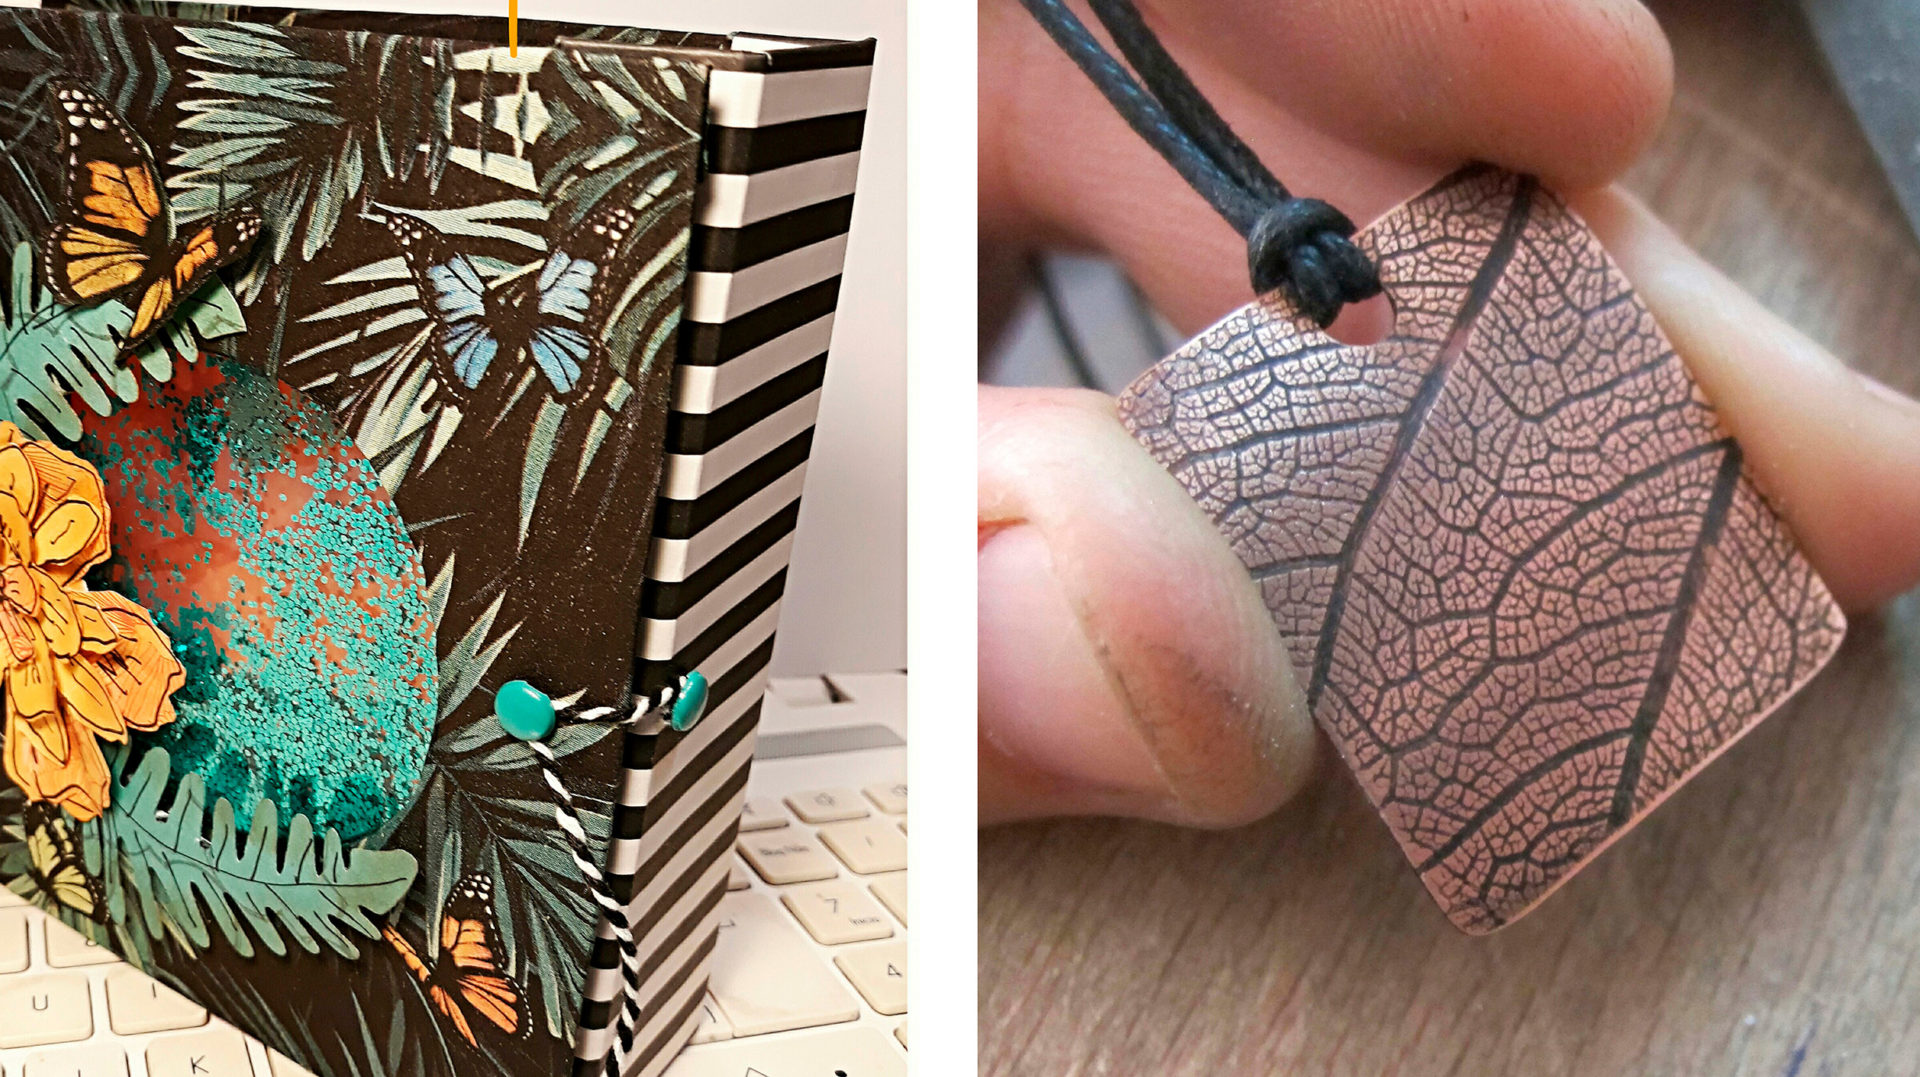 Ceràmica, scrapbooking, patchworking i joieria